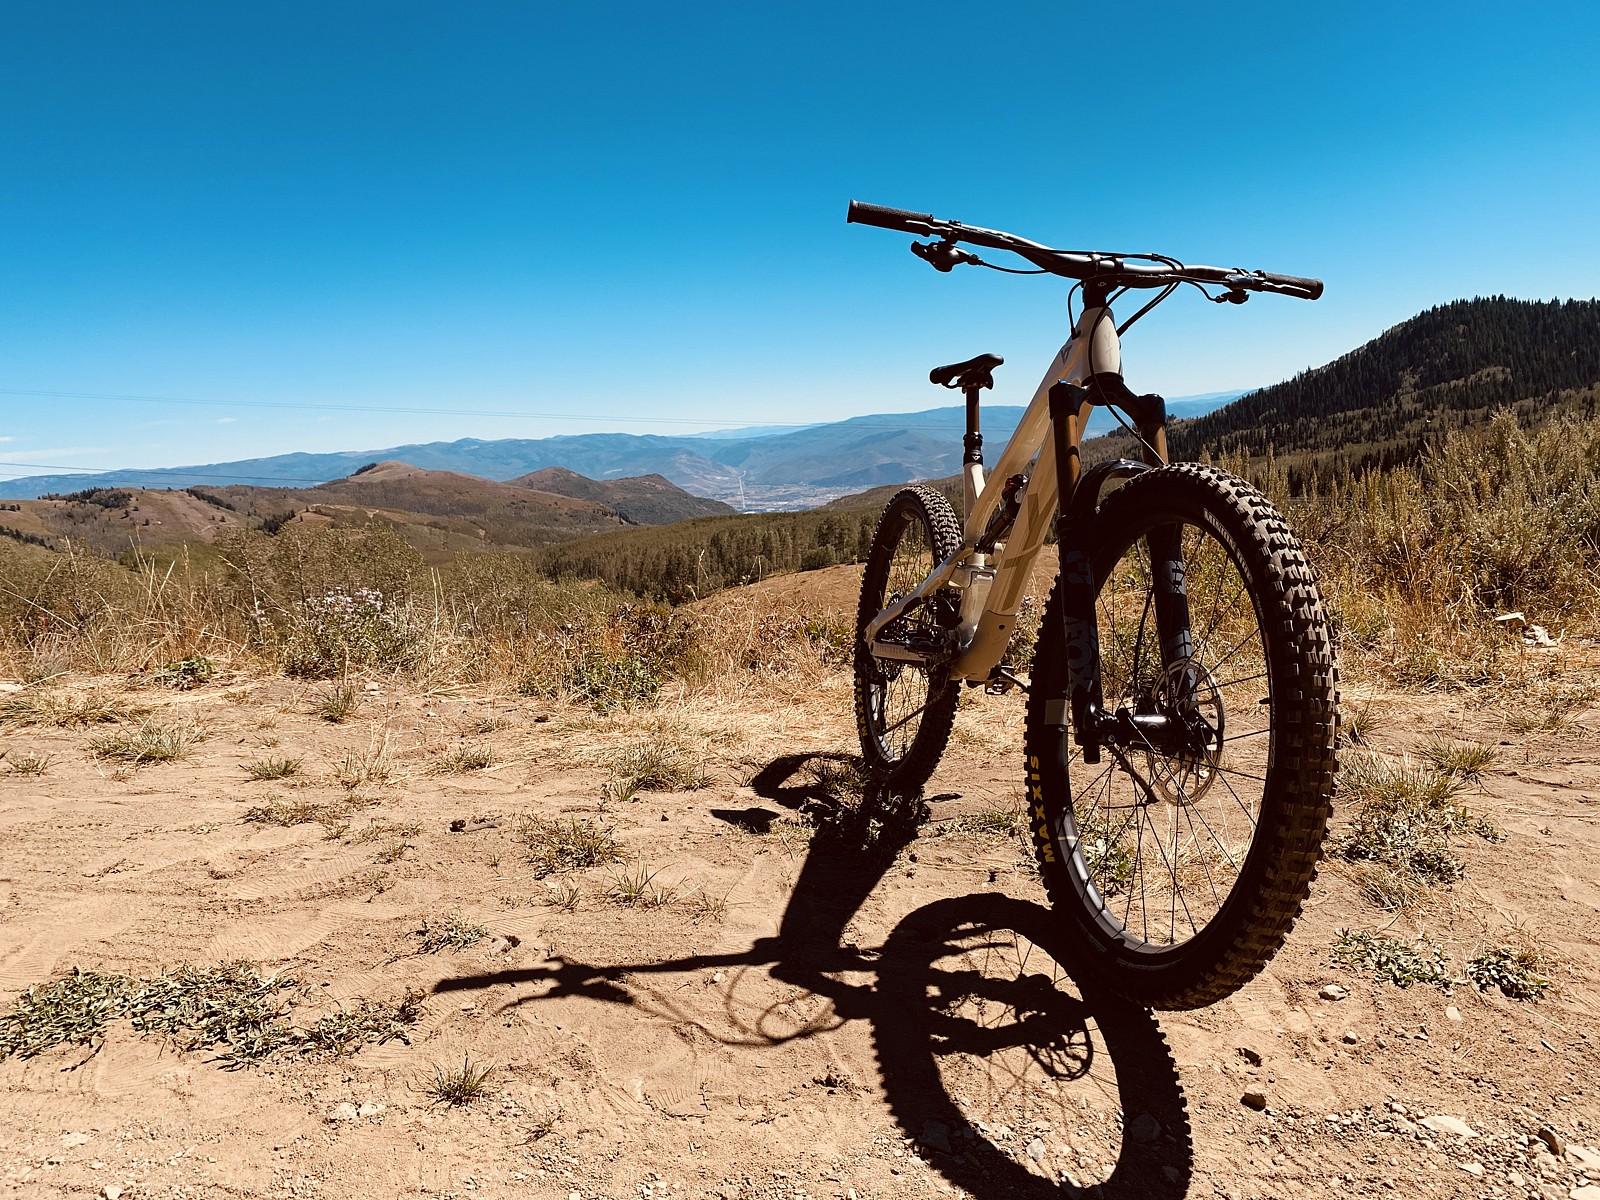 IMG E0211 - jaykalafatis - Mountain Biking Pictures - Vital MTB